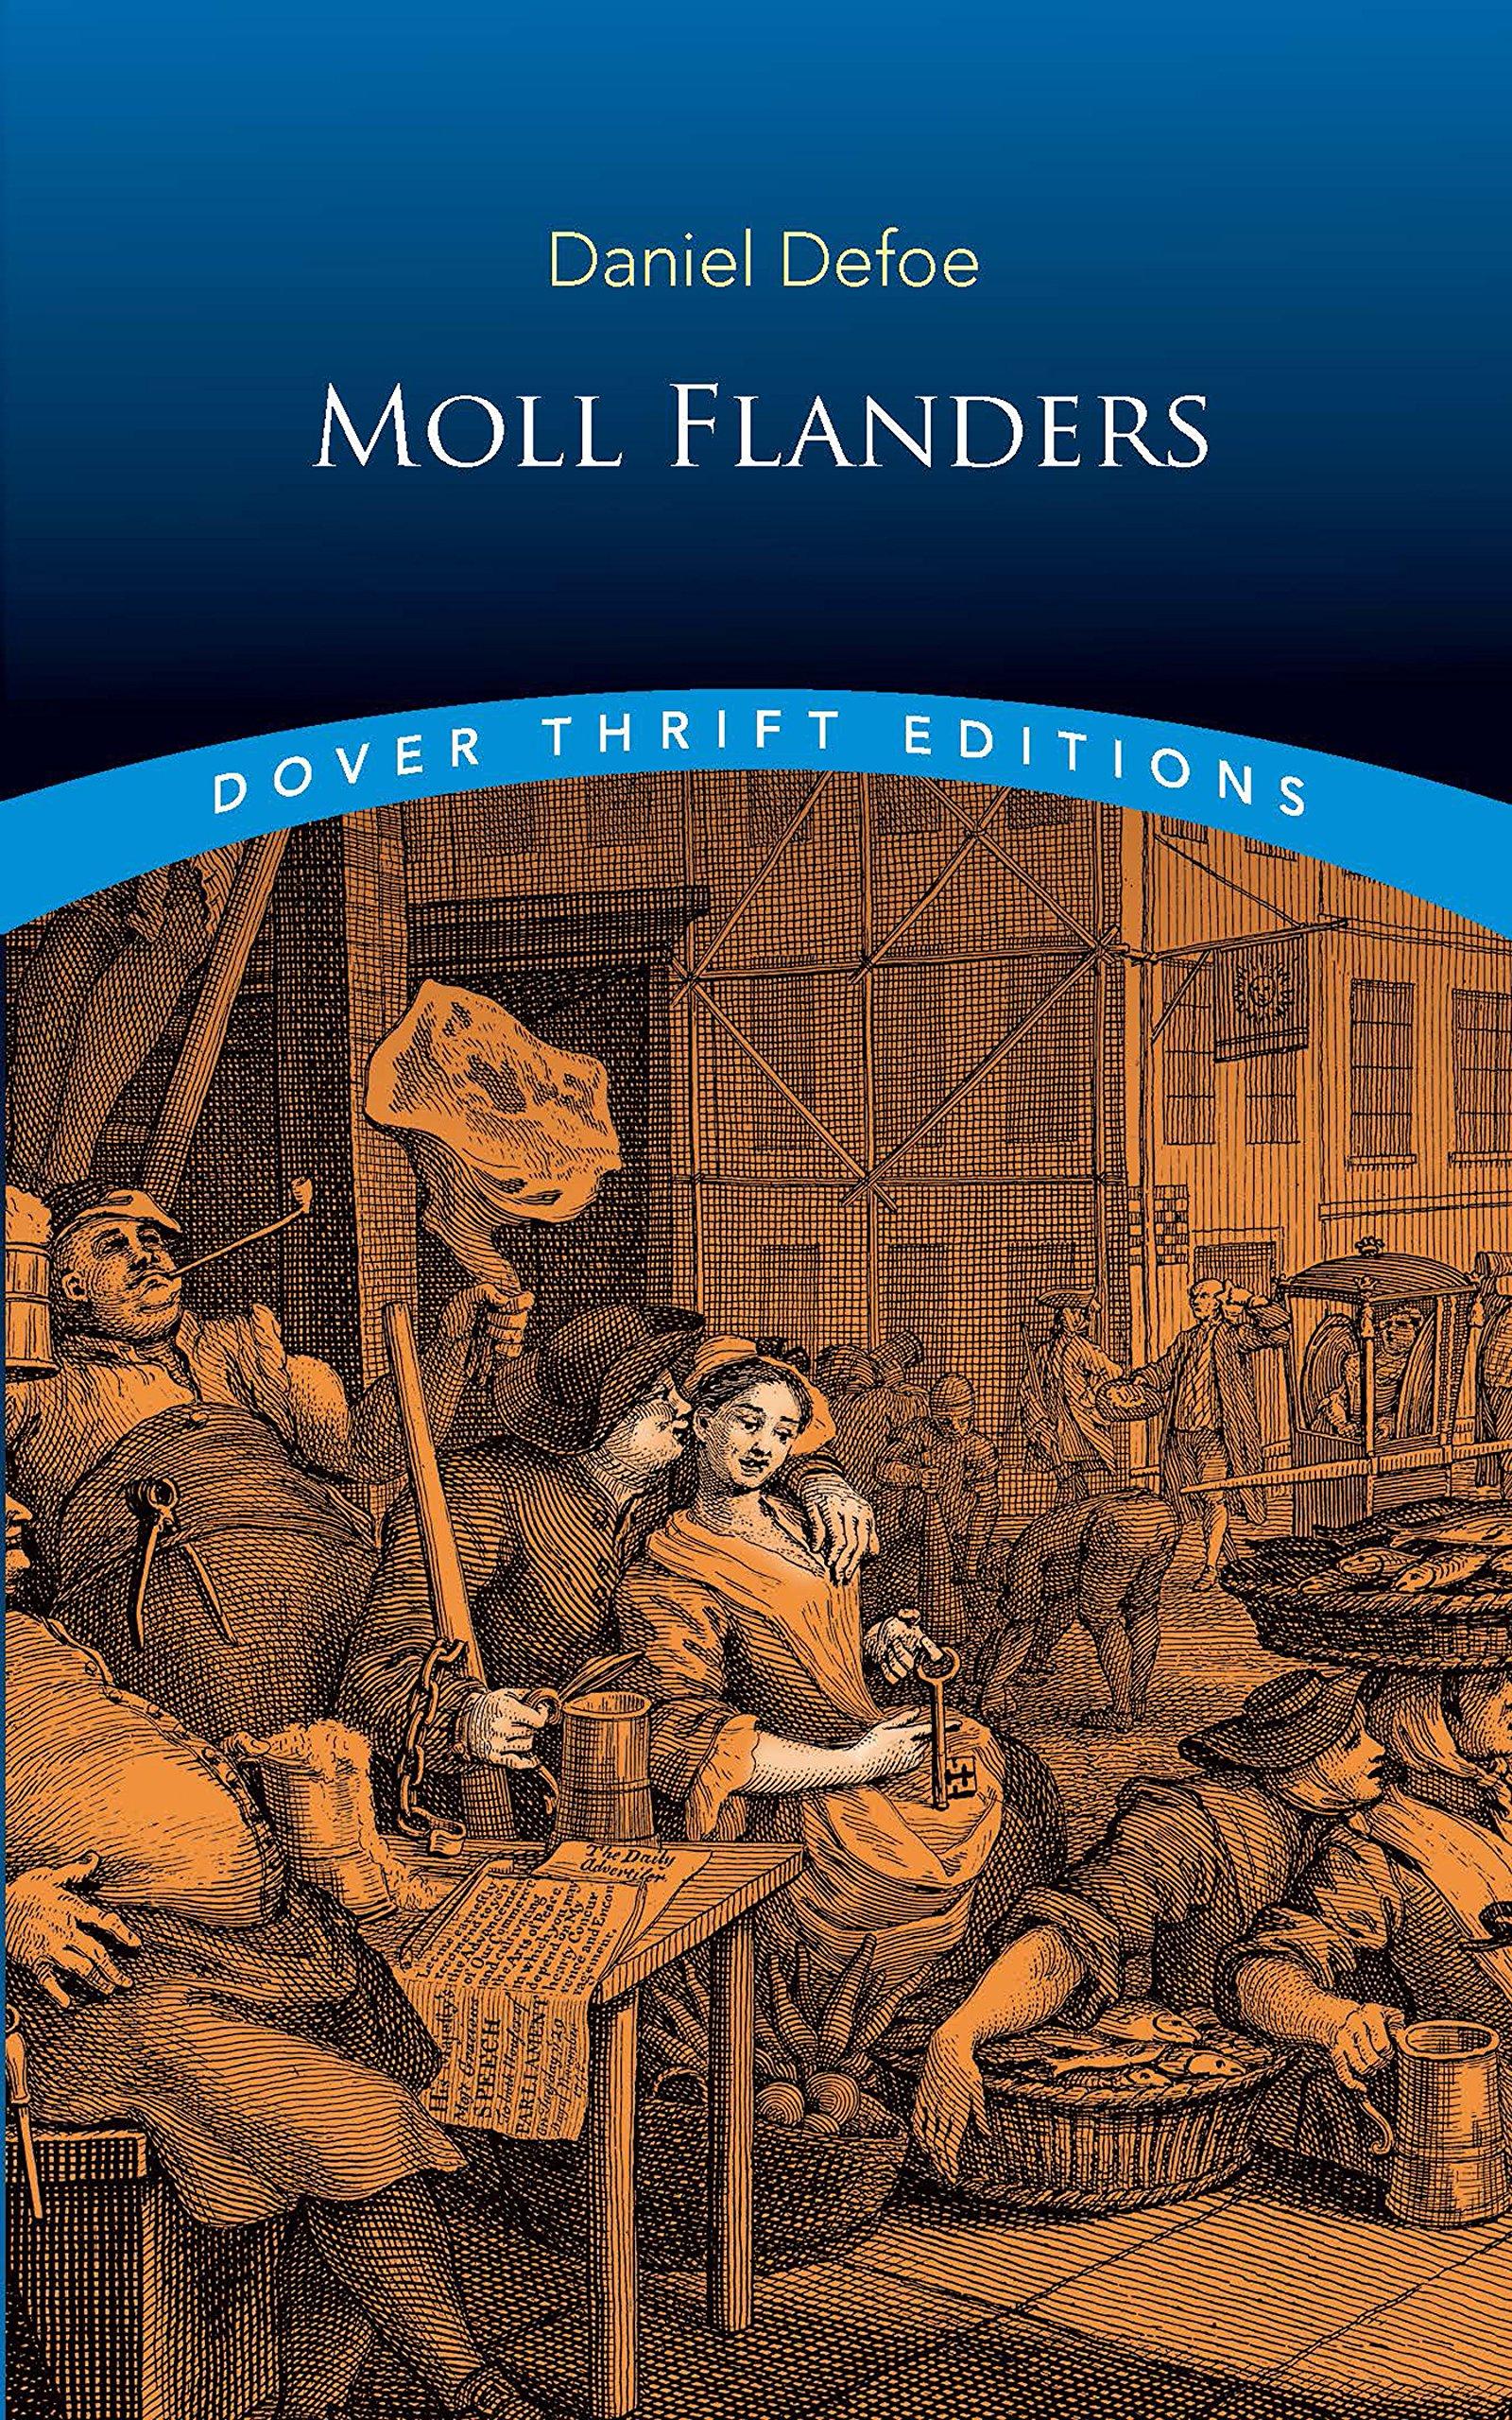 Dover Thrift Editions: MOLL FLANDERS